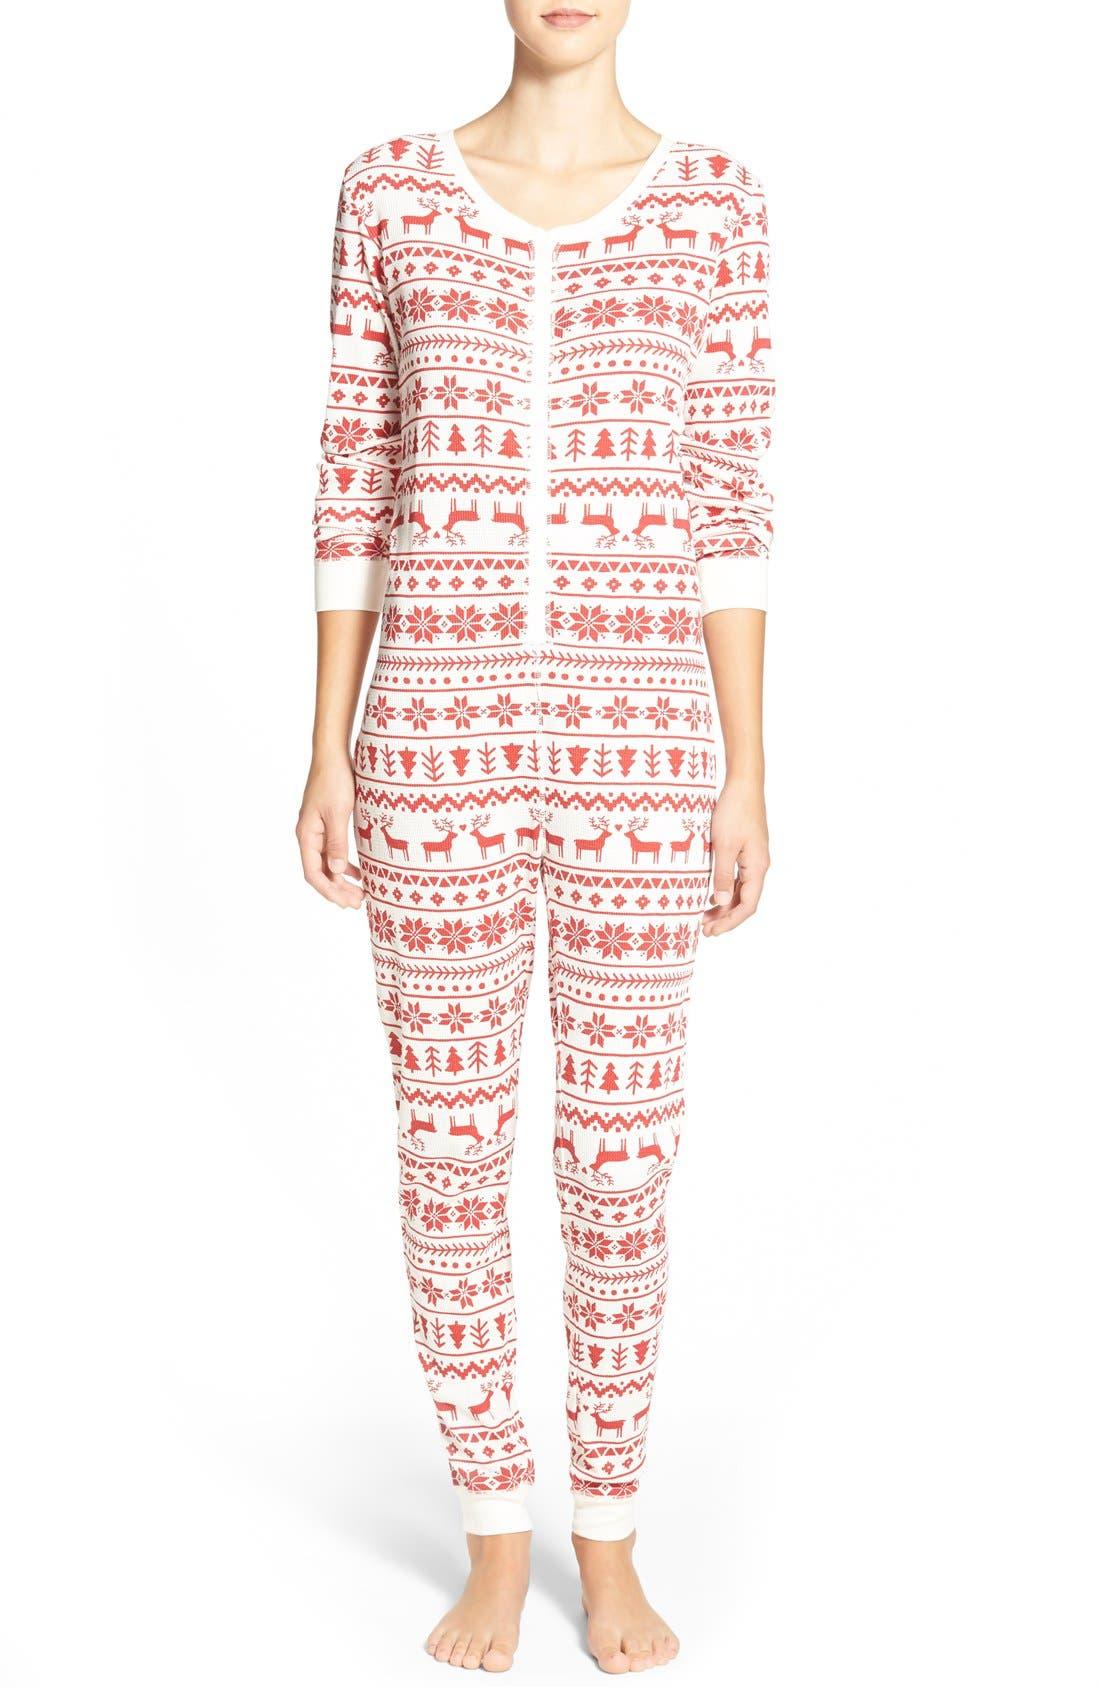 Main Image - BP. Undercover Holiday Thermal One-Piece Pajamas